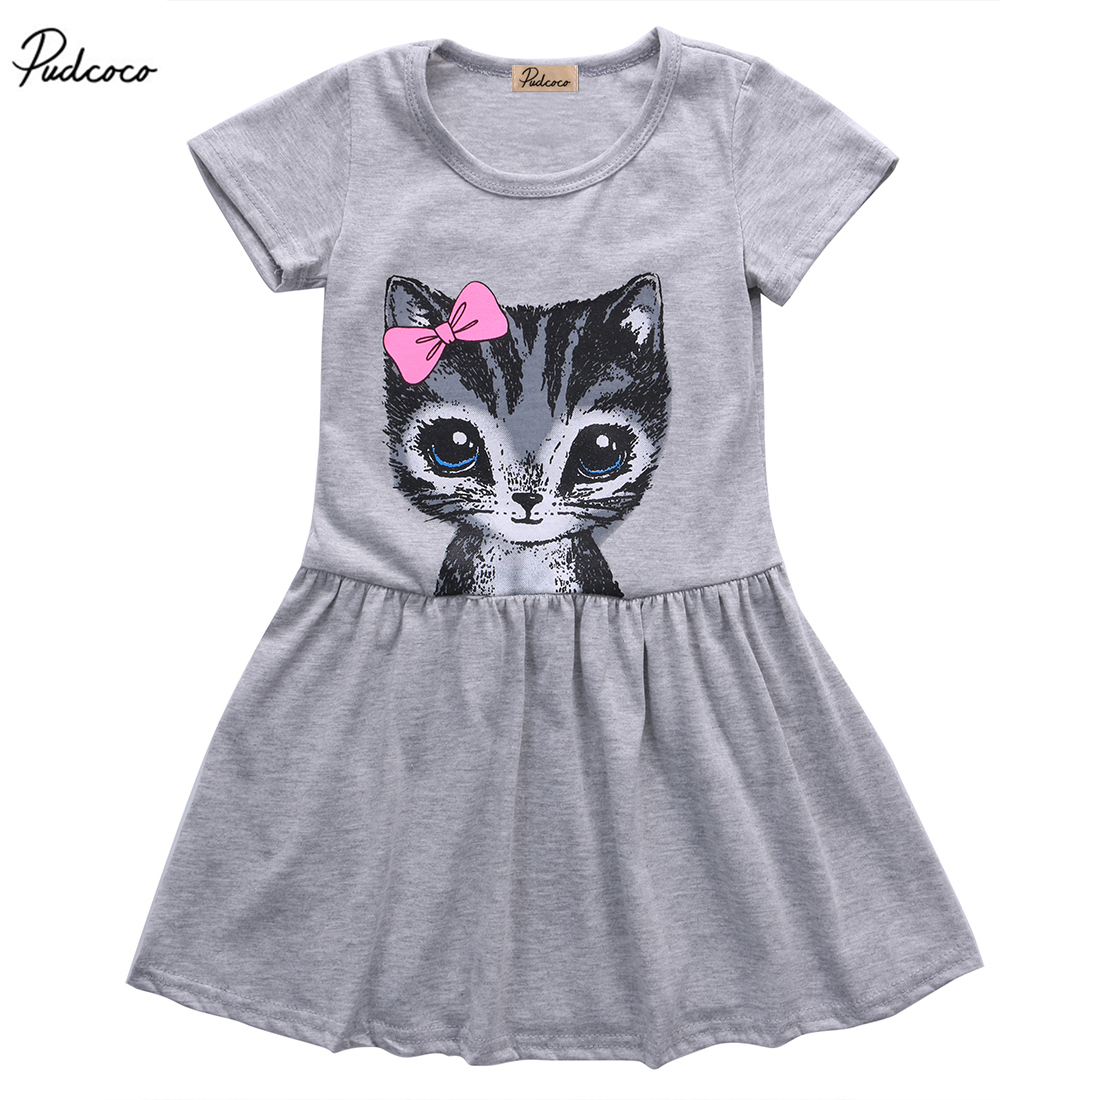 Pudcoco Cute Cat Lovely Dress Toddler Baby Girls Princess Short Sleeve Dress Party Kids Tulle Tutu Dress Gray Pink